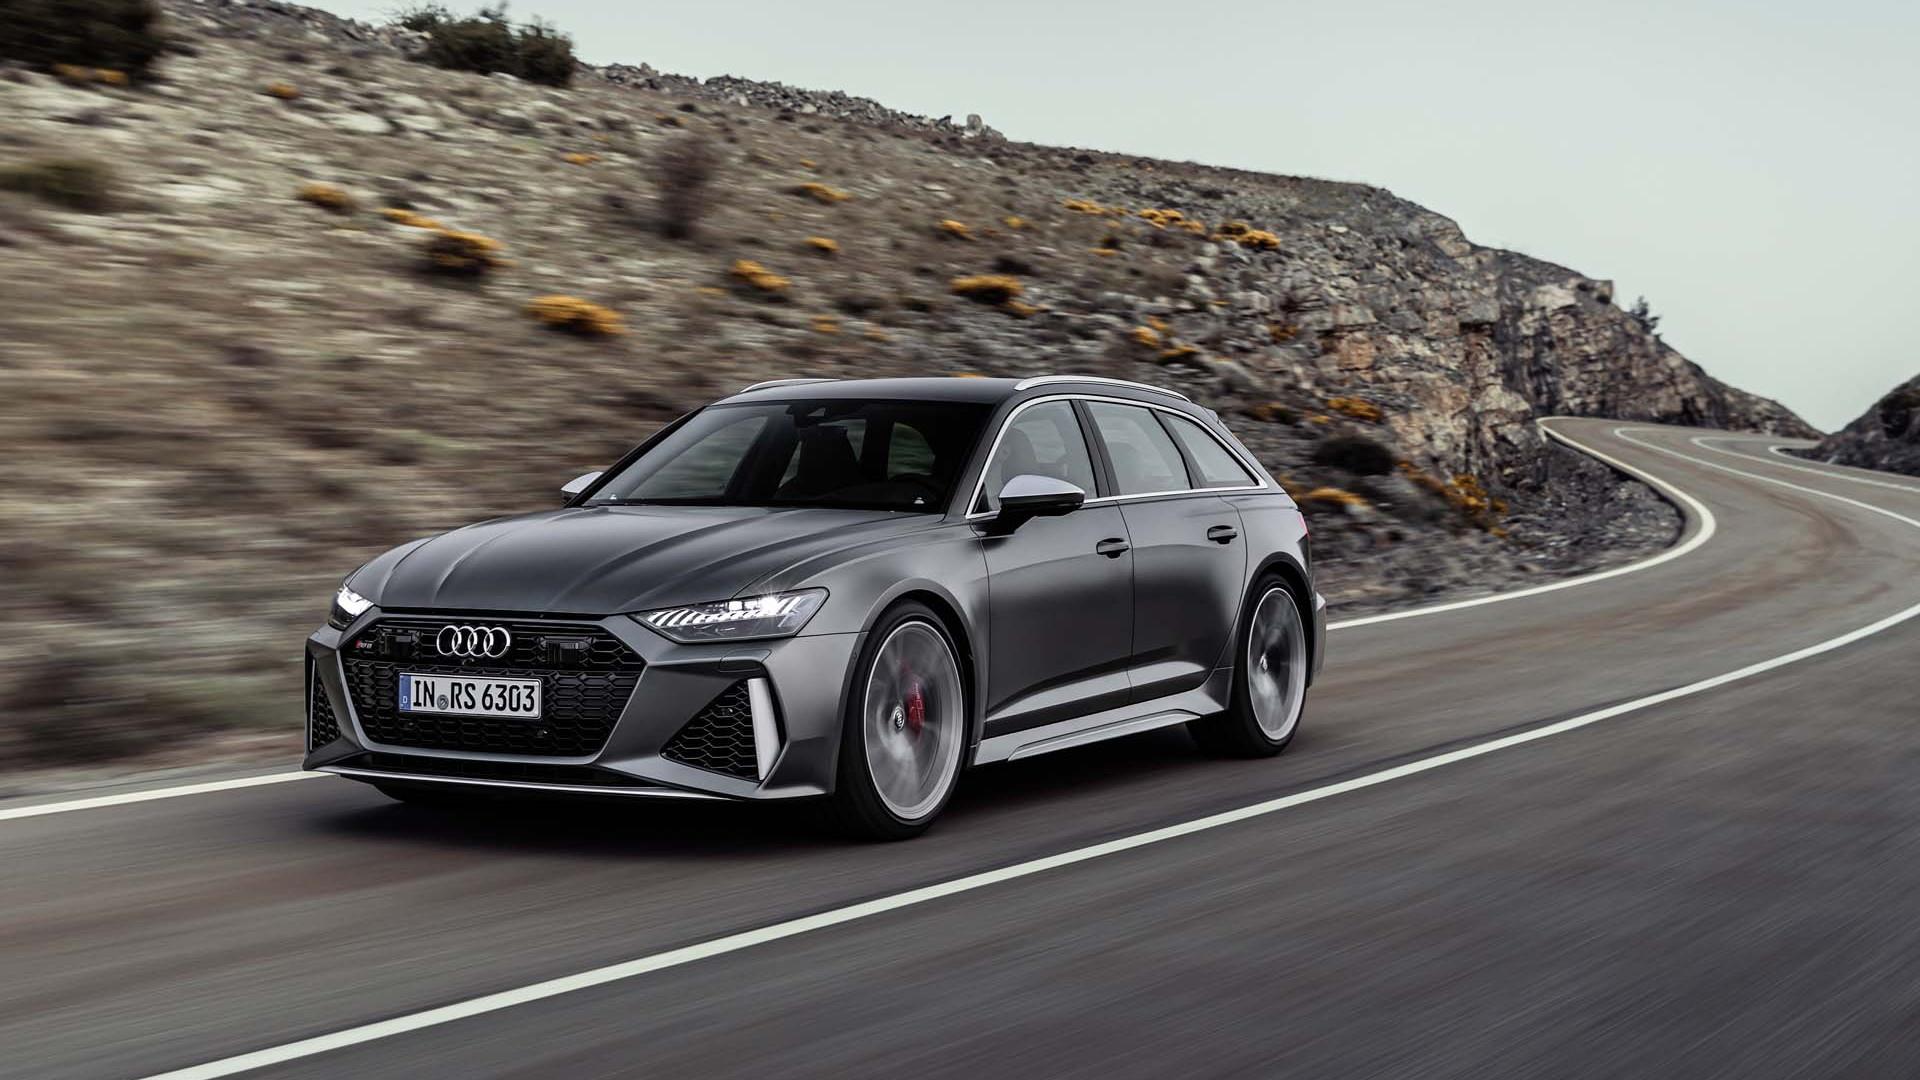 Audi RS 9 Avant to make US debut at Malibu Cars & Coffee | who make audi cars